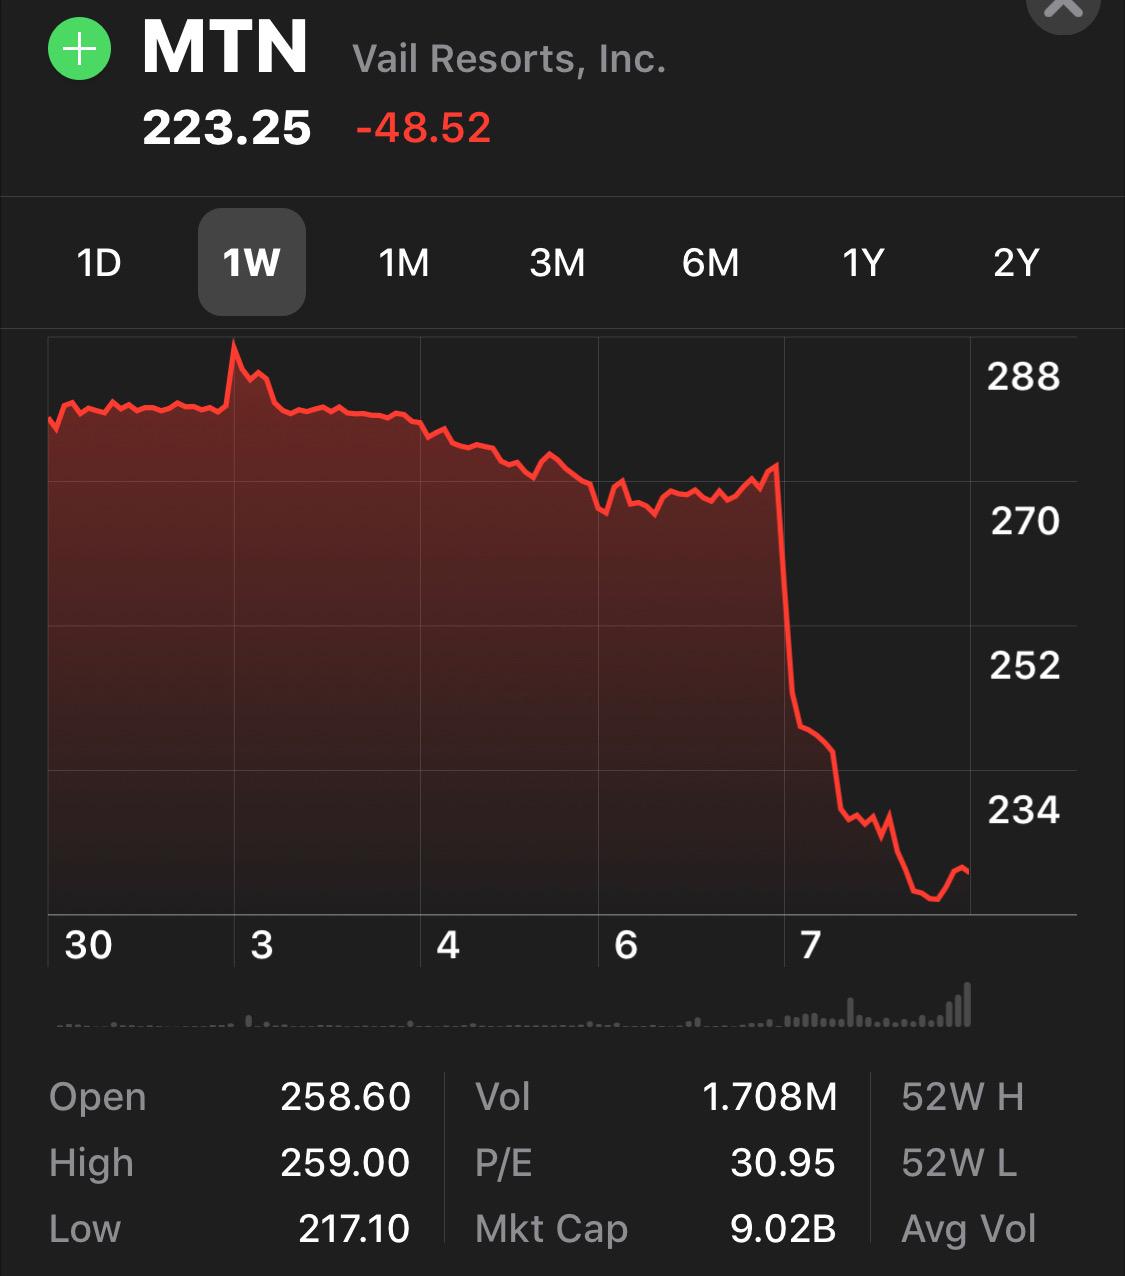 vail resorts, stock price,